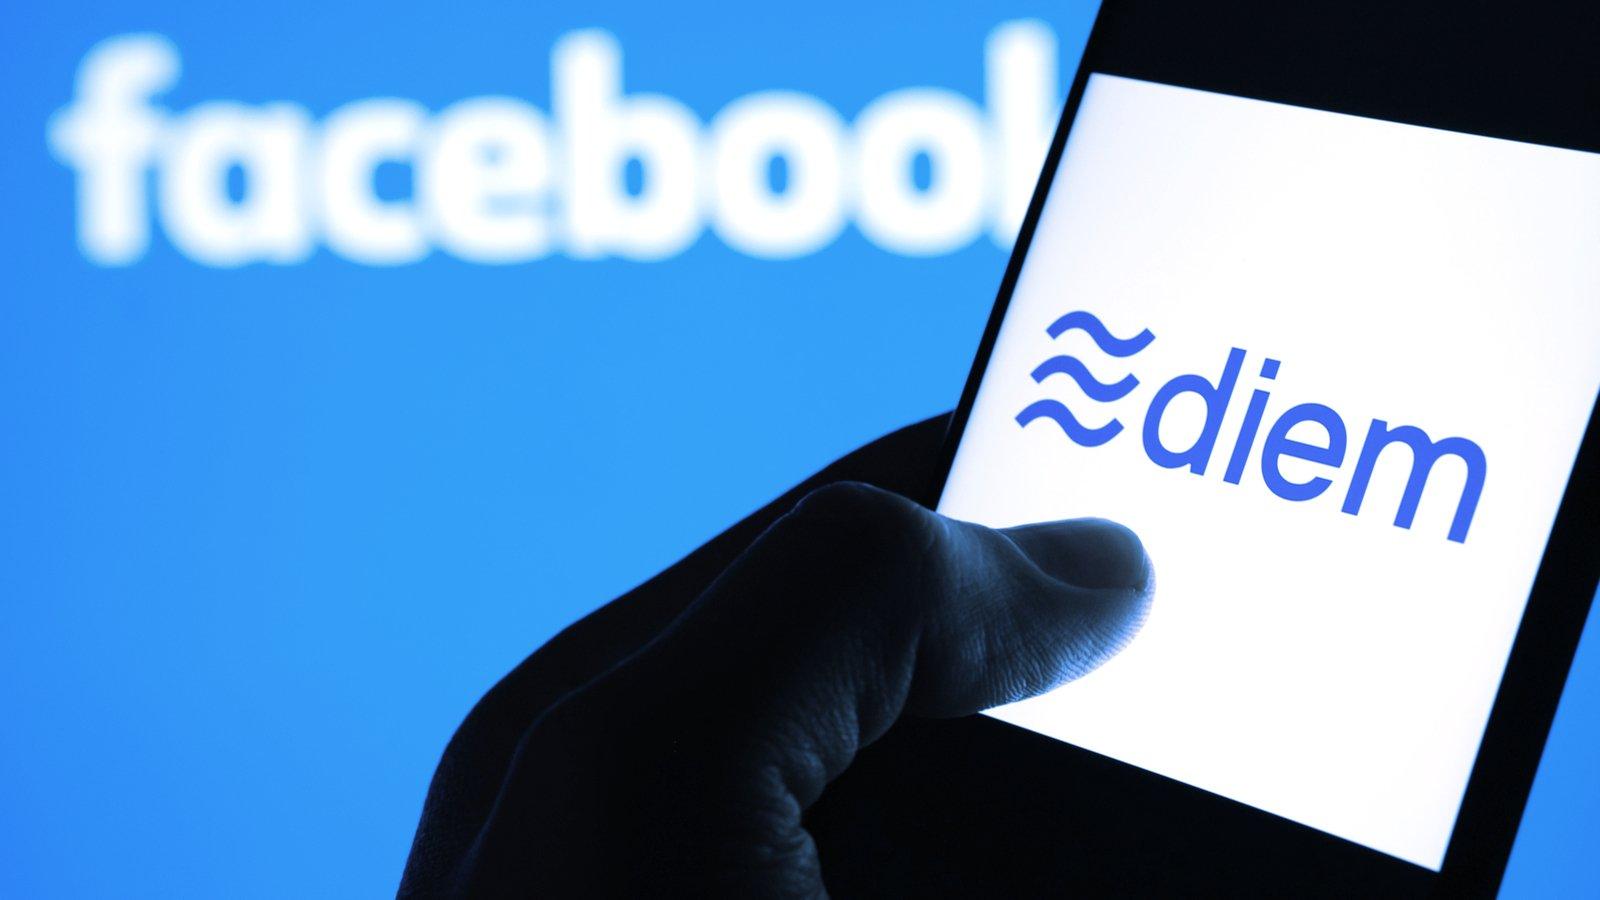 Pontem and Pinknode Team Up to Bridge Polkadot and Facebook's Diem